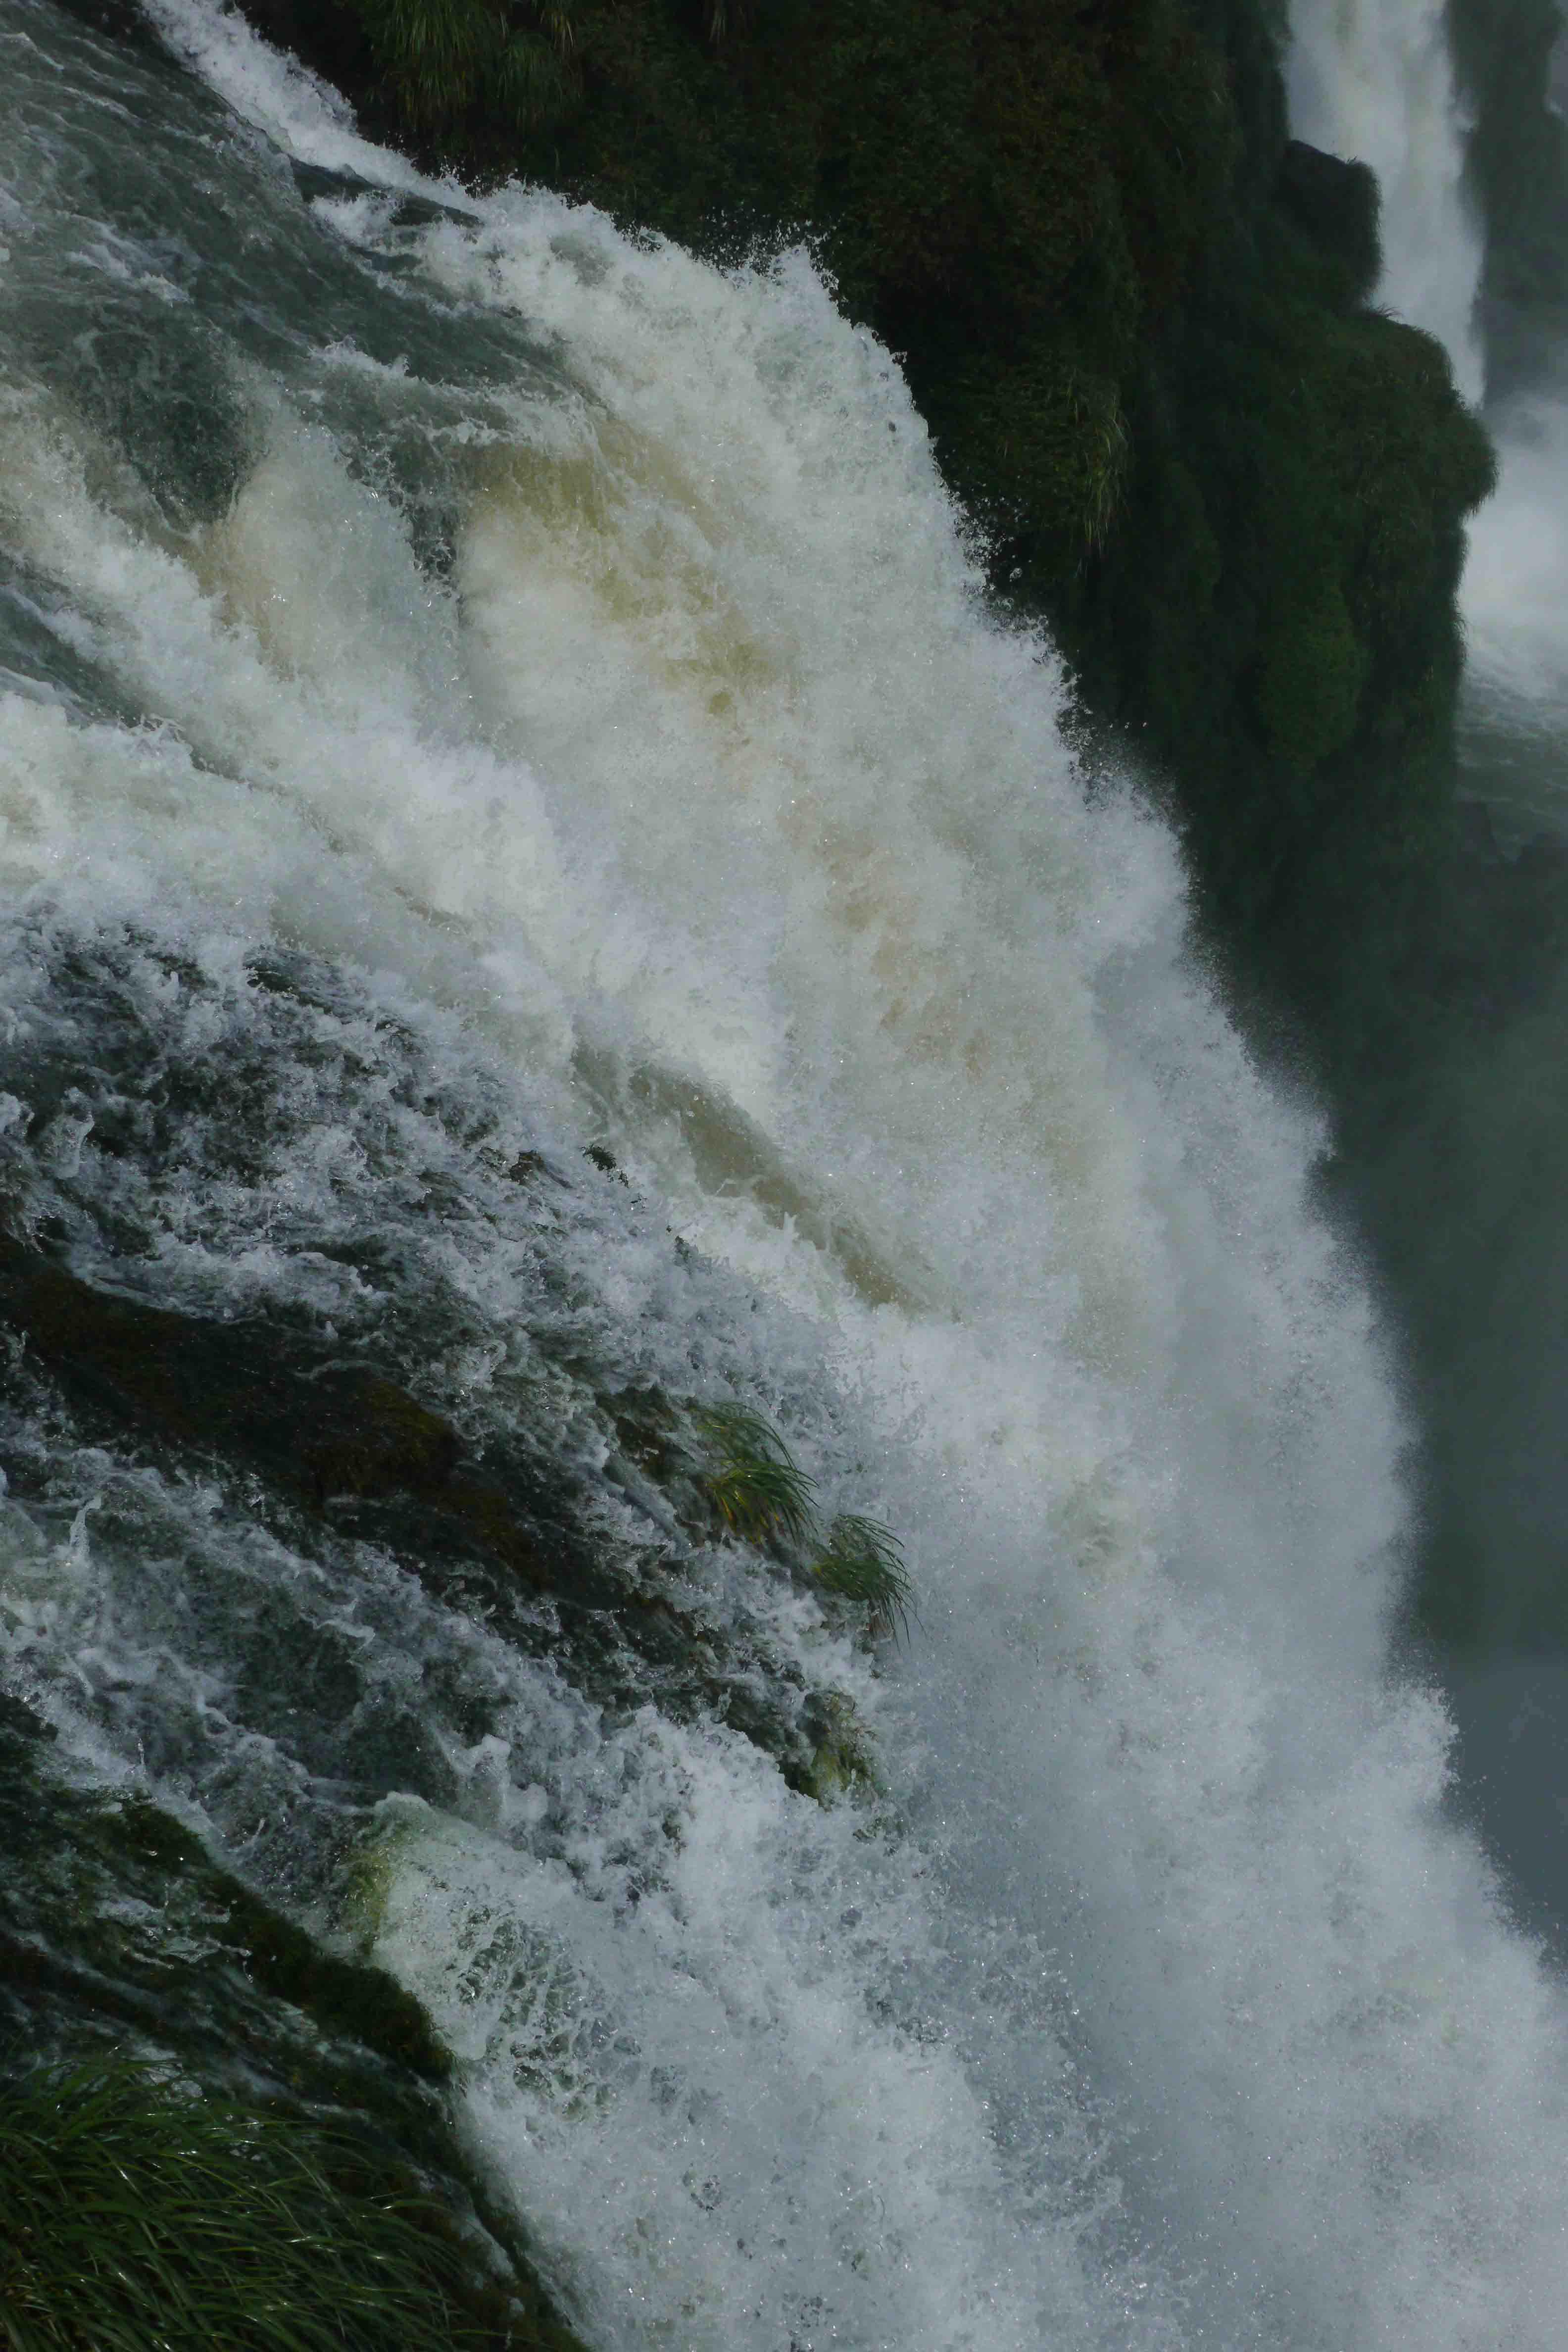 0311508wasserfallebrasilien116jpeg